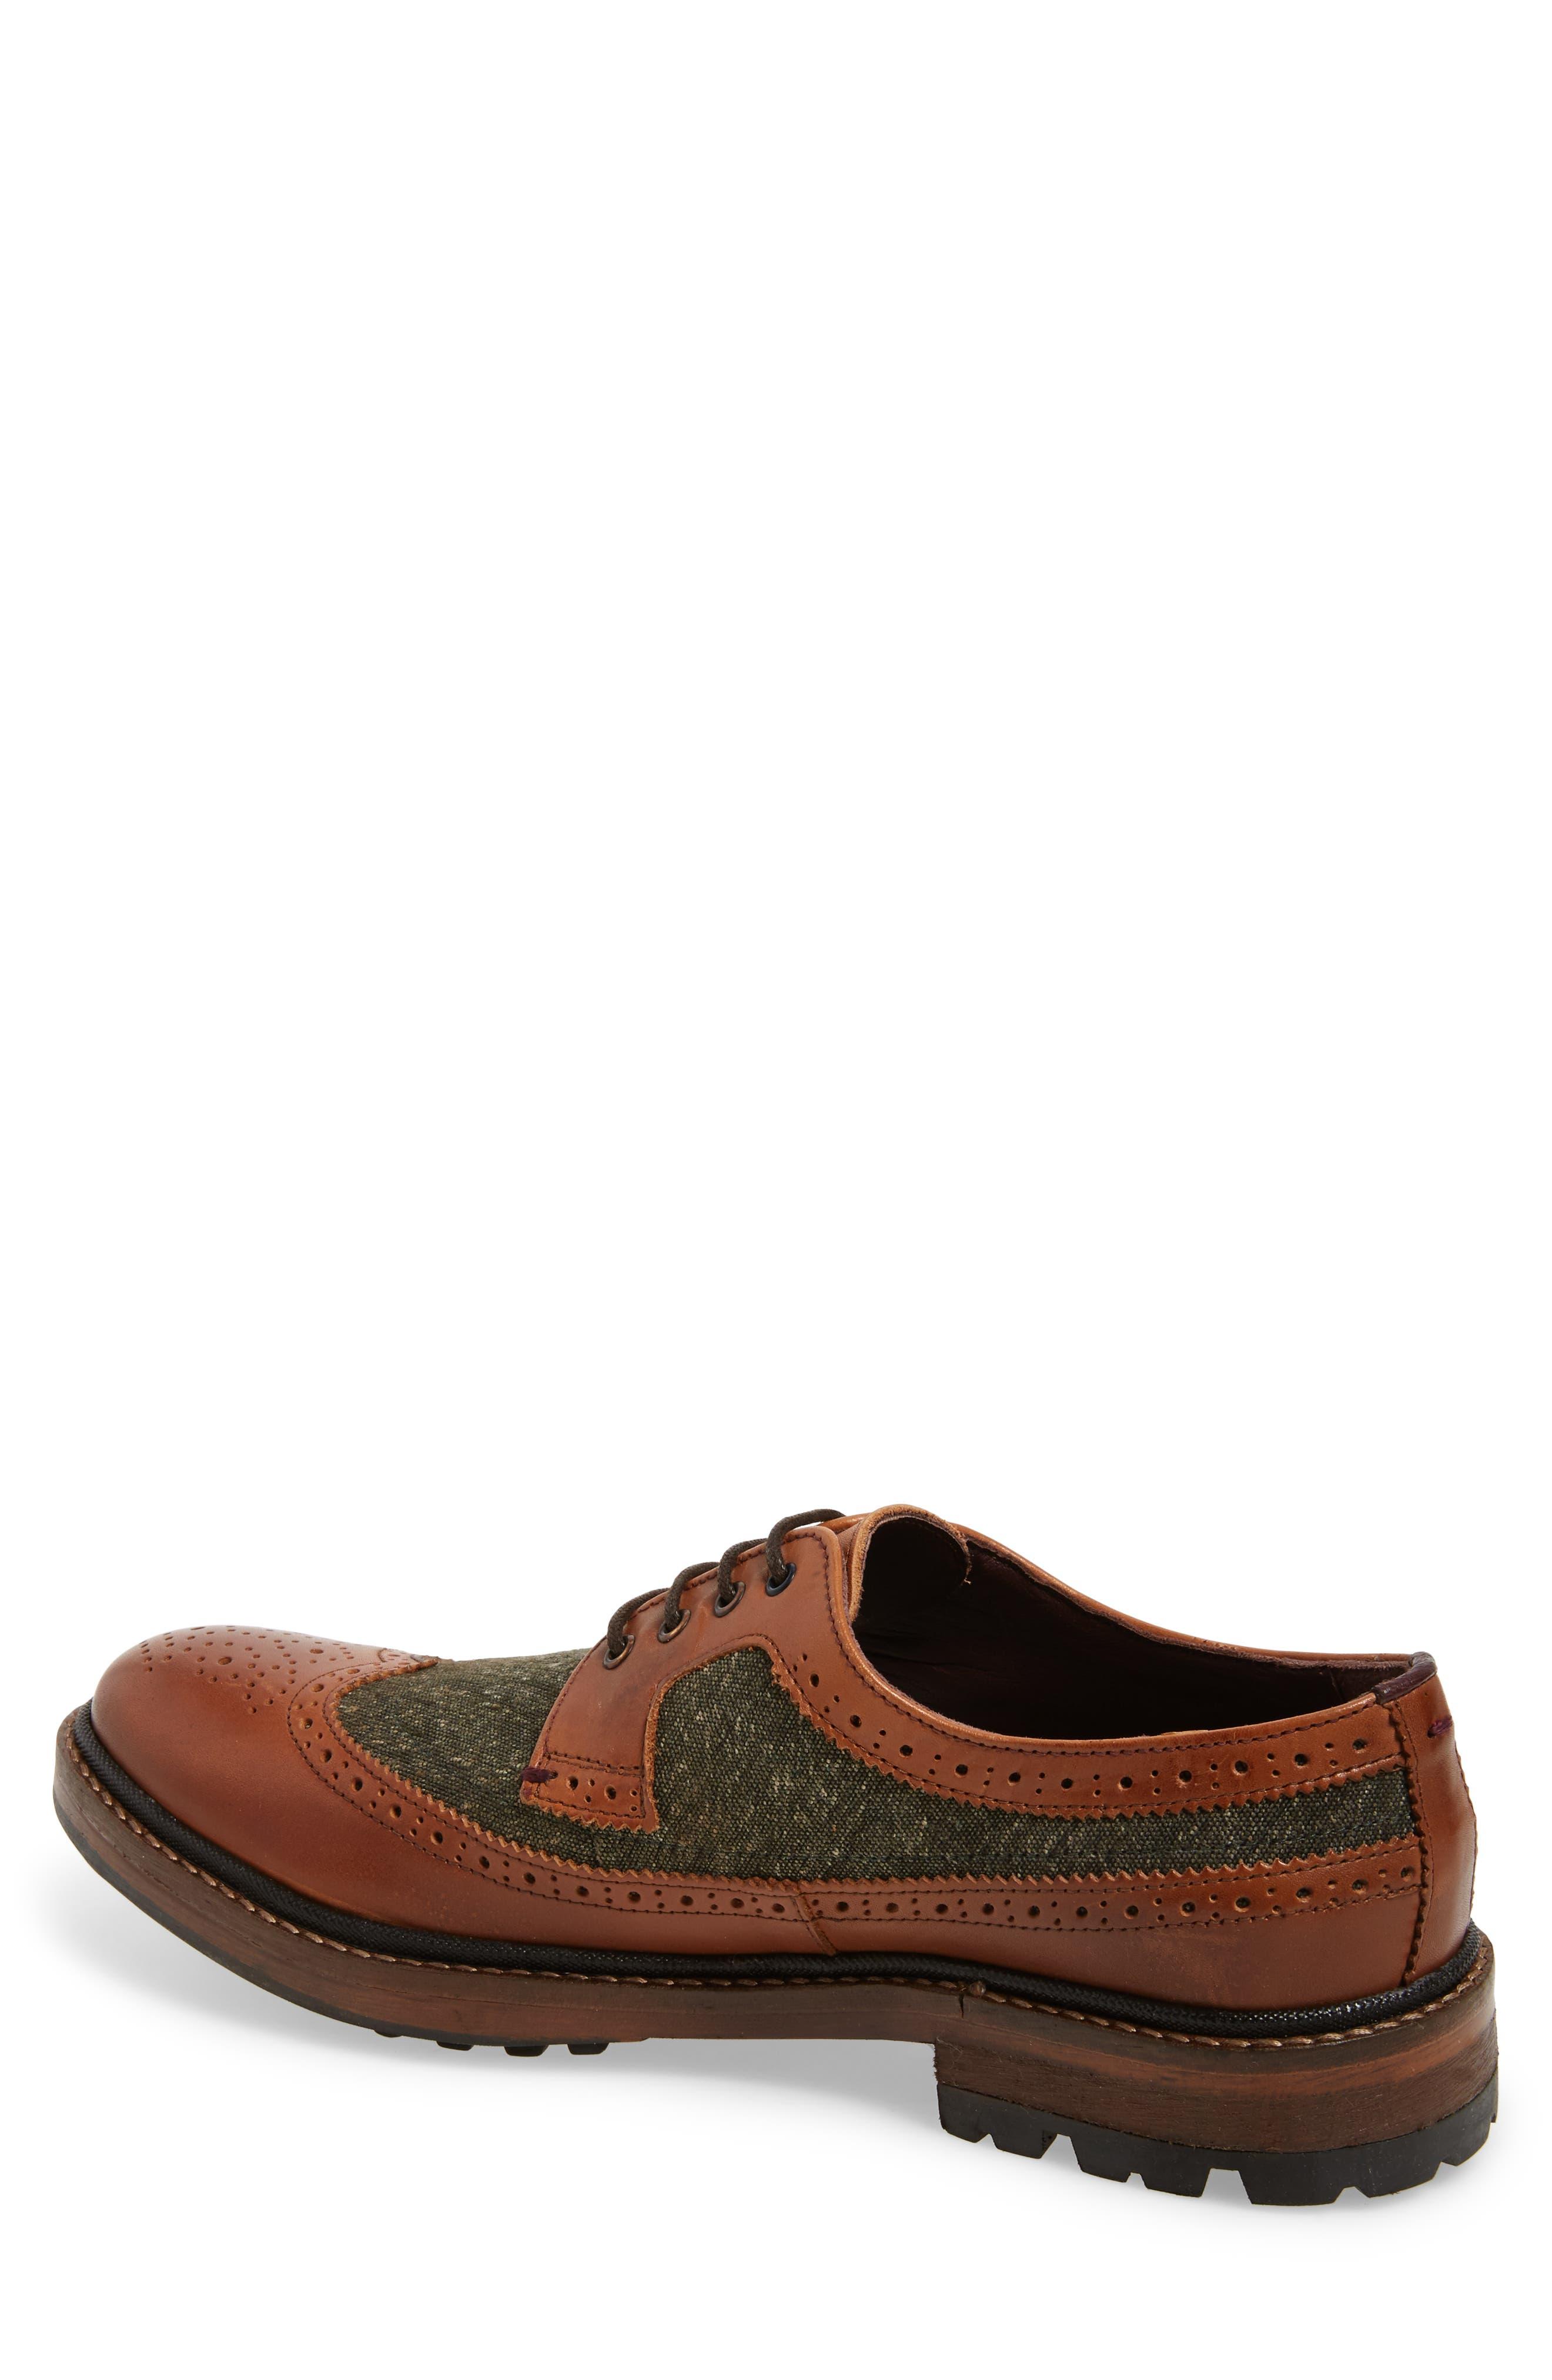 Casbo Spectator Shoe,                             Alternate thumbnail 2, color,                             Tan Multi Leather